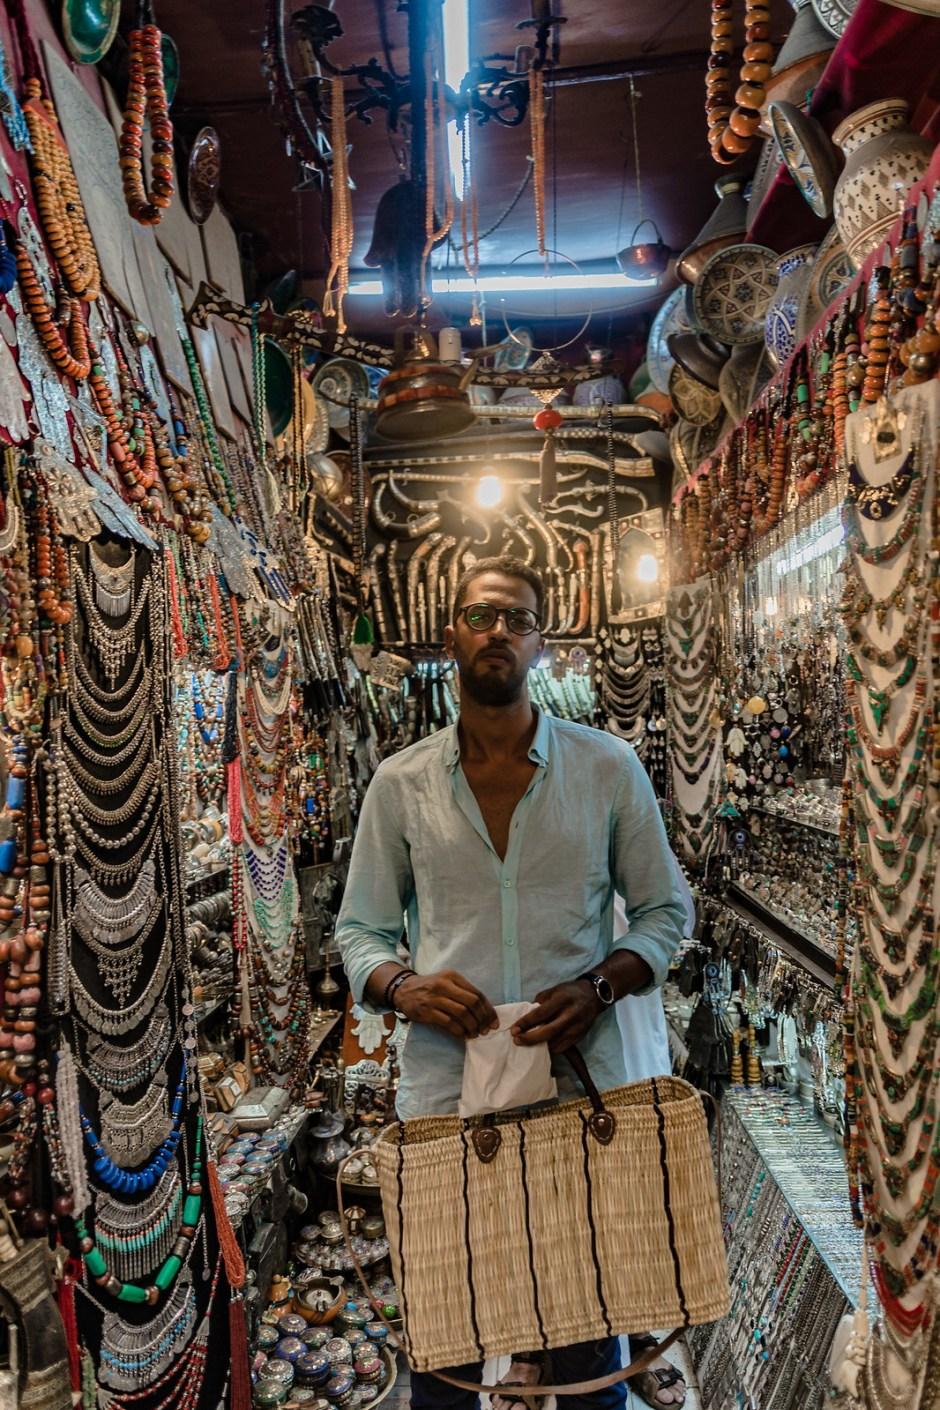 Souk_marrakech_SMALL